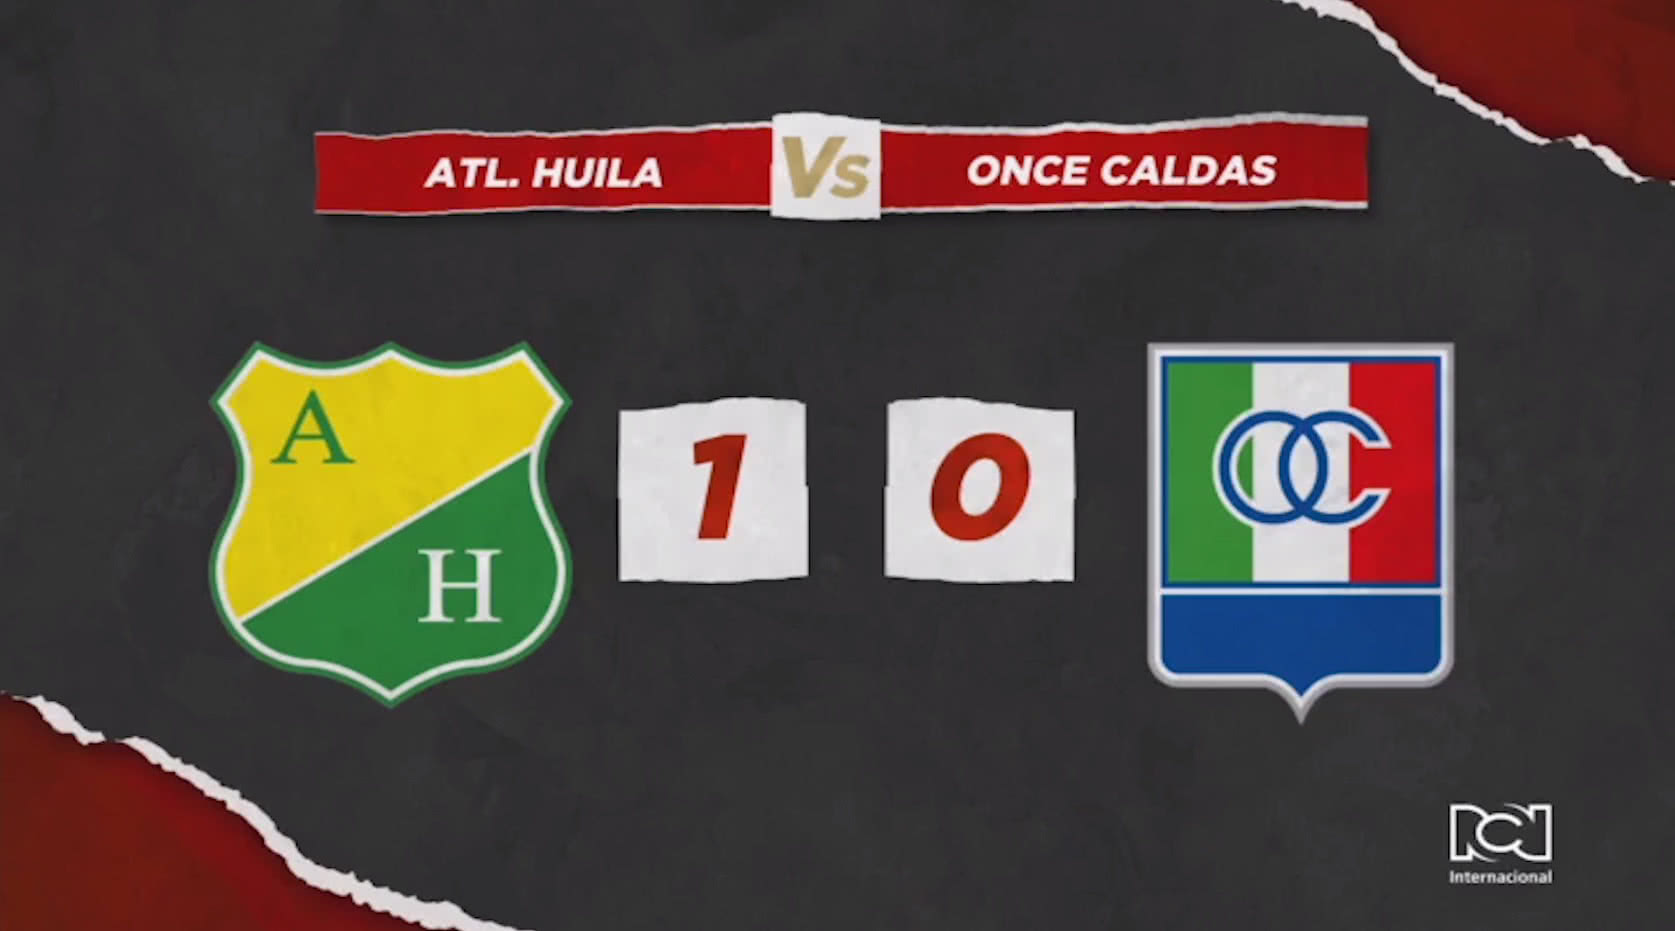 huila-vs-once-caldas.jpg